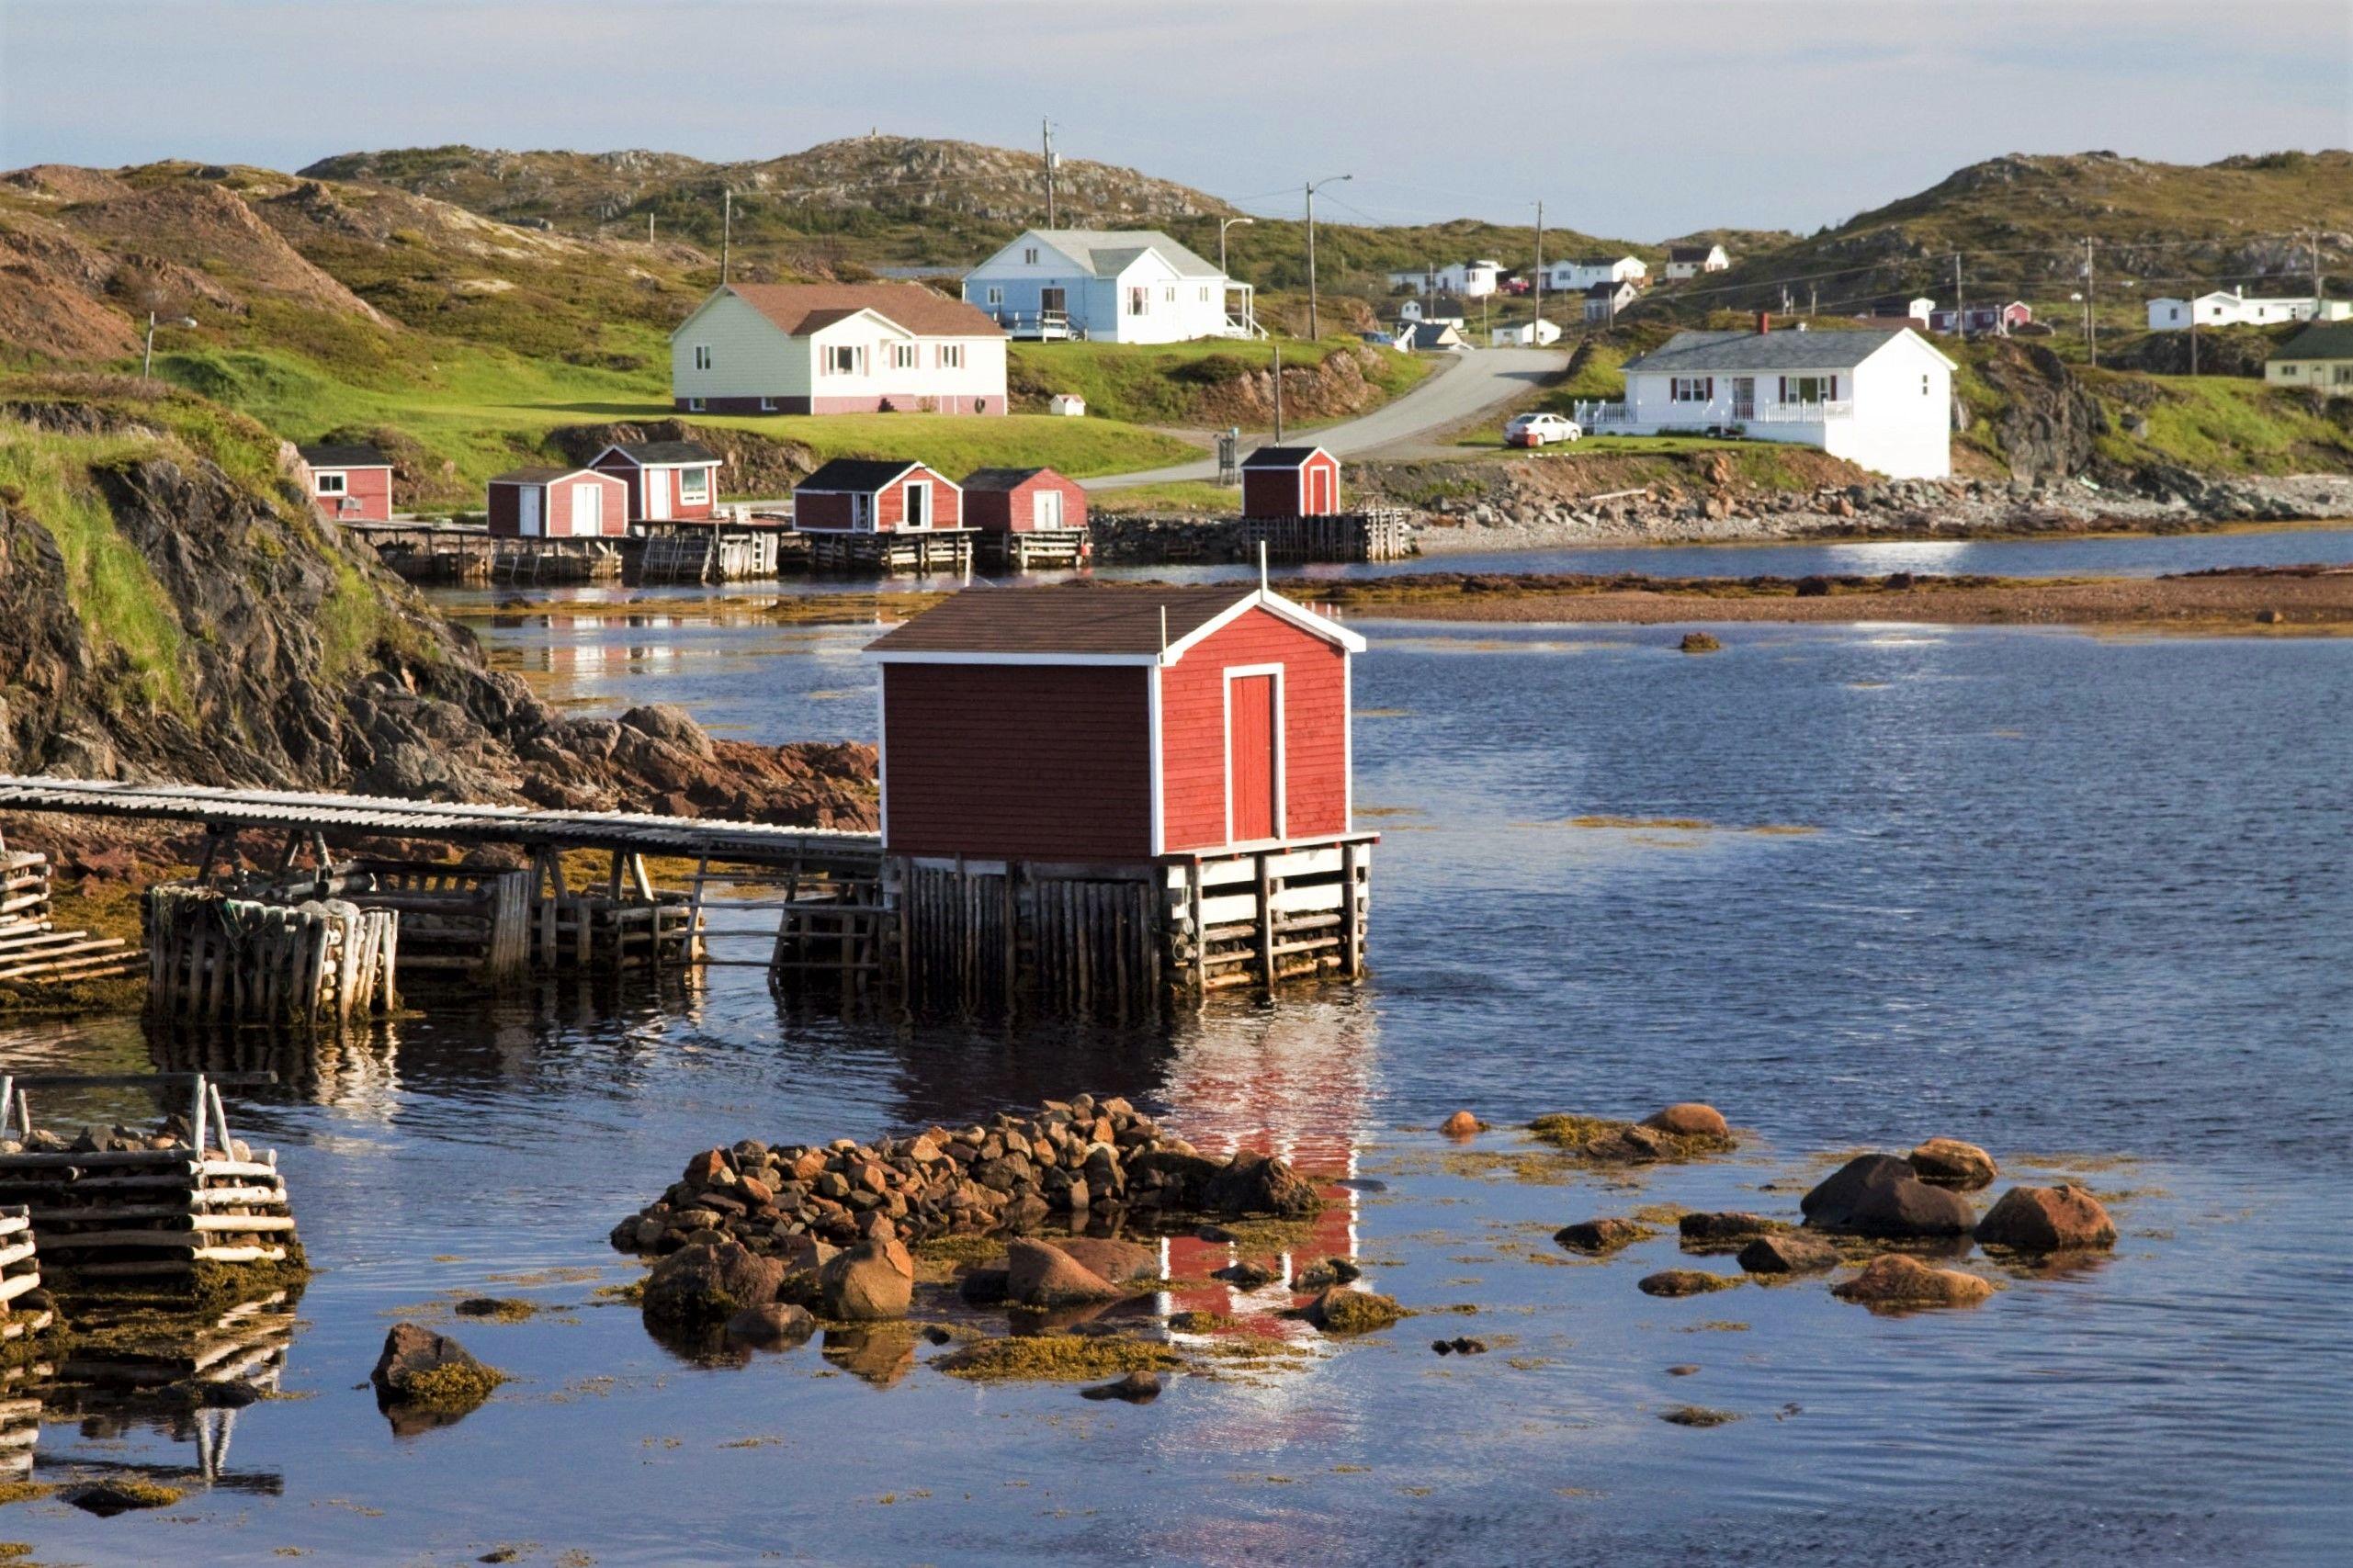 Atlantic-Canada-Newfoundland-huisje-1_1_528646 Canada